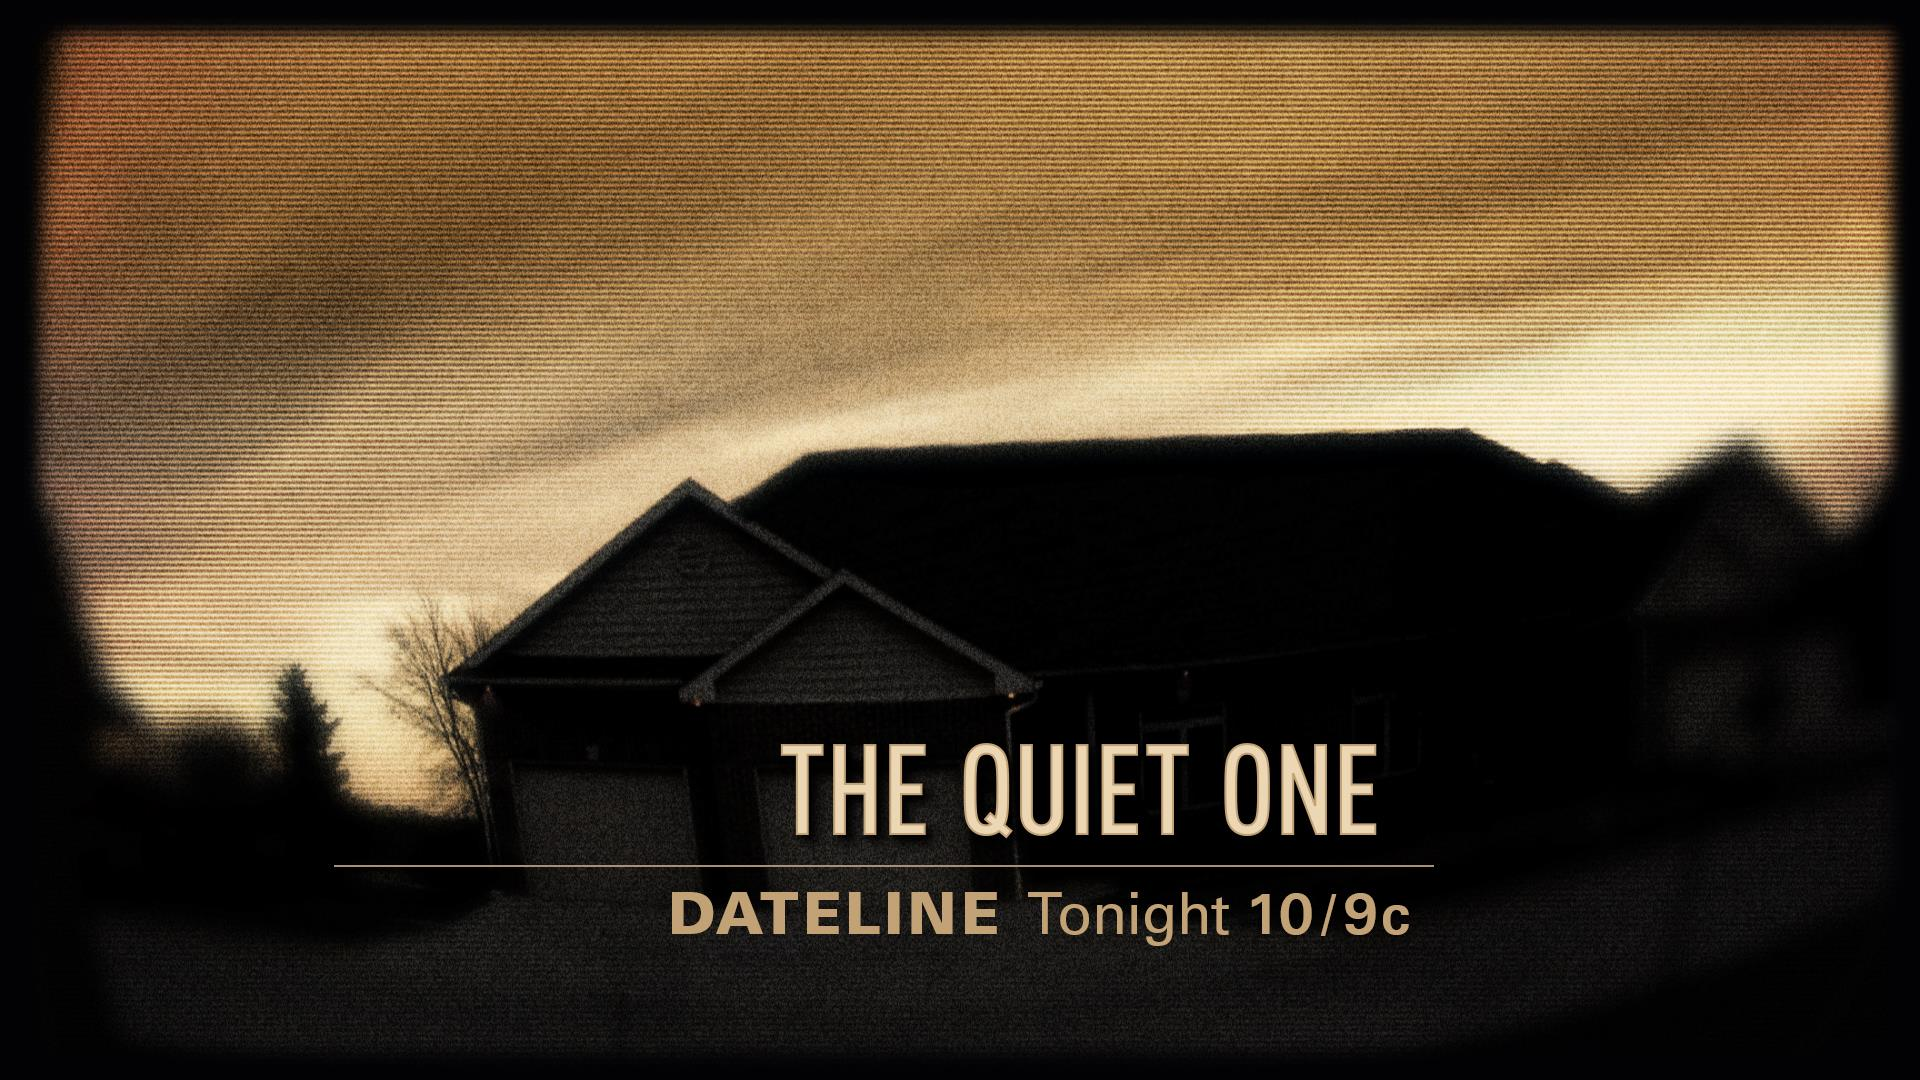 SNEAK PEEK: The Quiet One